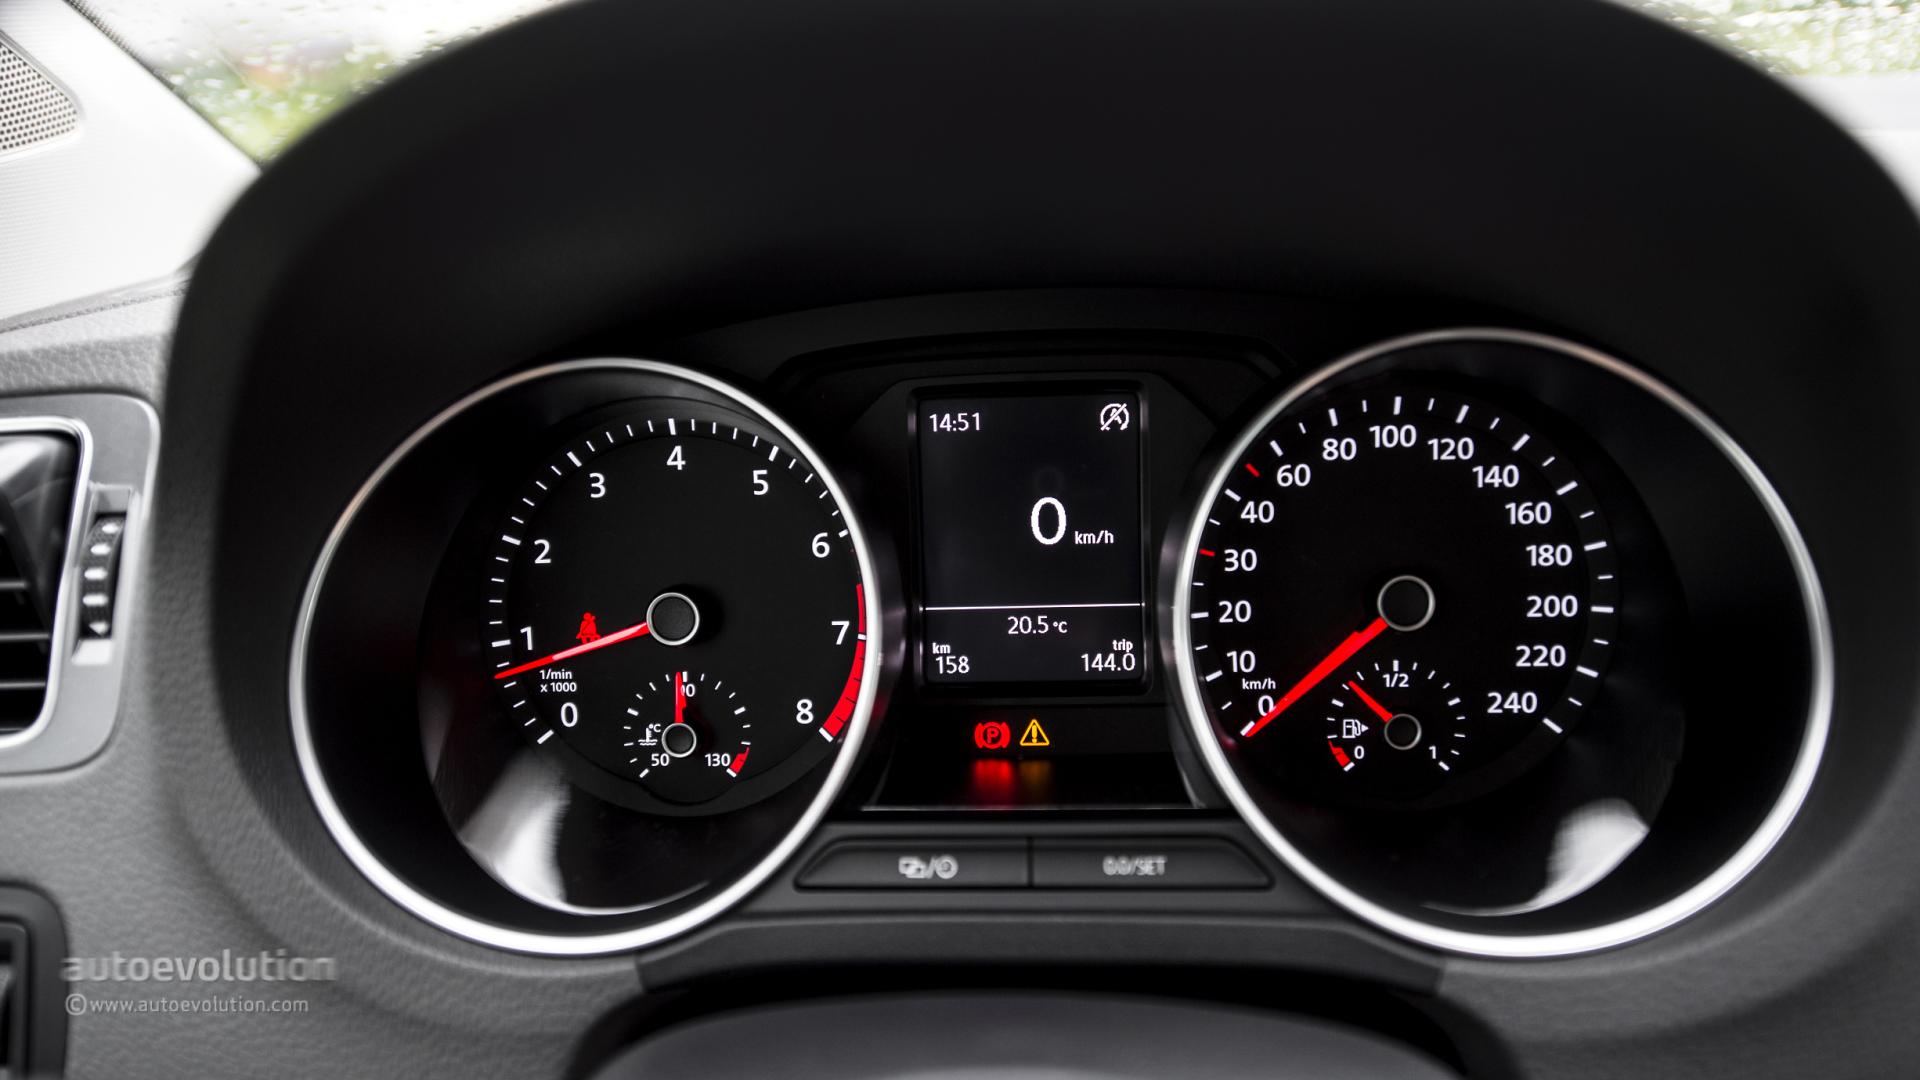 2014 Volkswagen Polo 12 Tsi First Drive Autoevolution